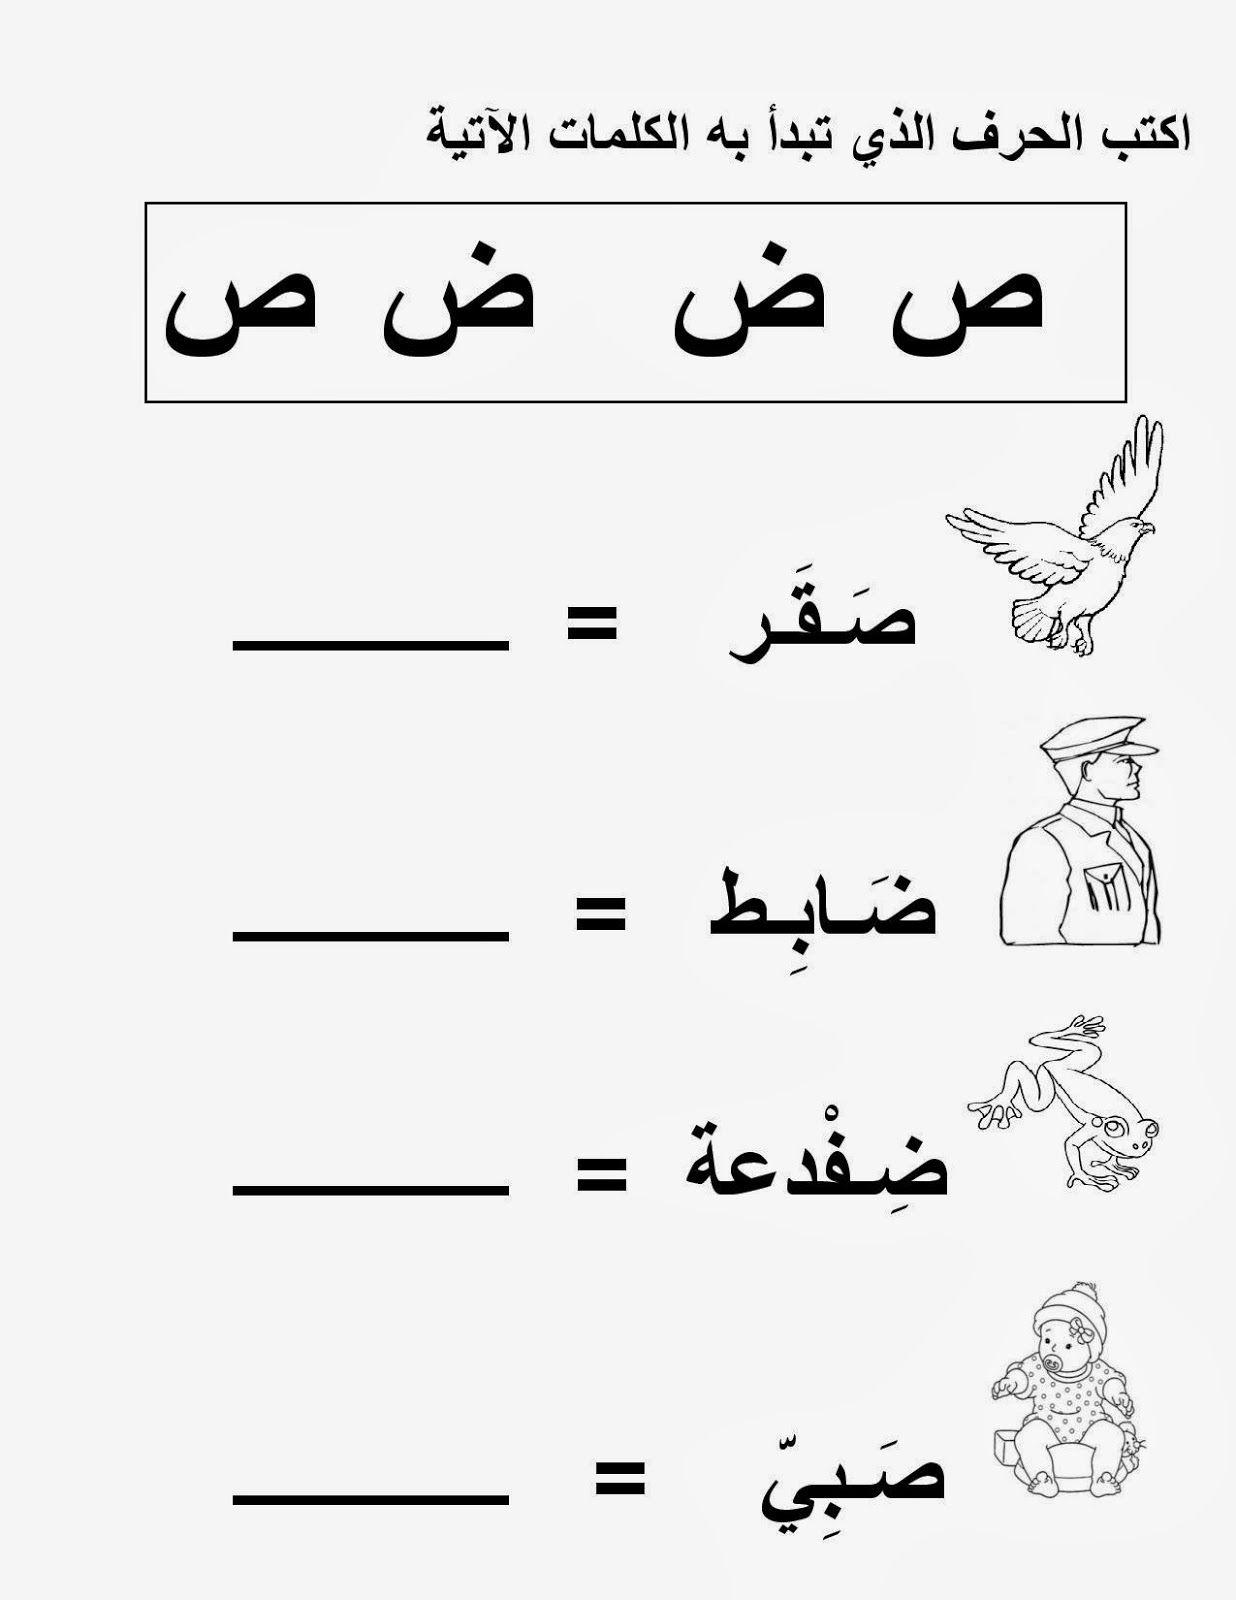 Alif Ba Ta Arabic Letters Worksheet For Kids 25th Oct